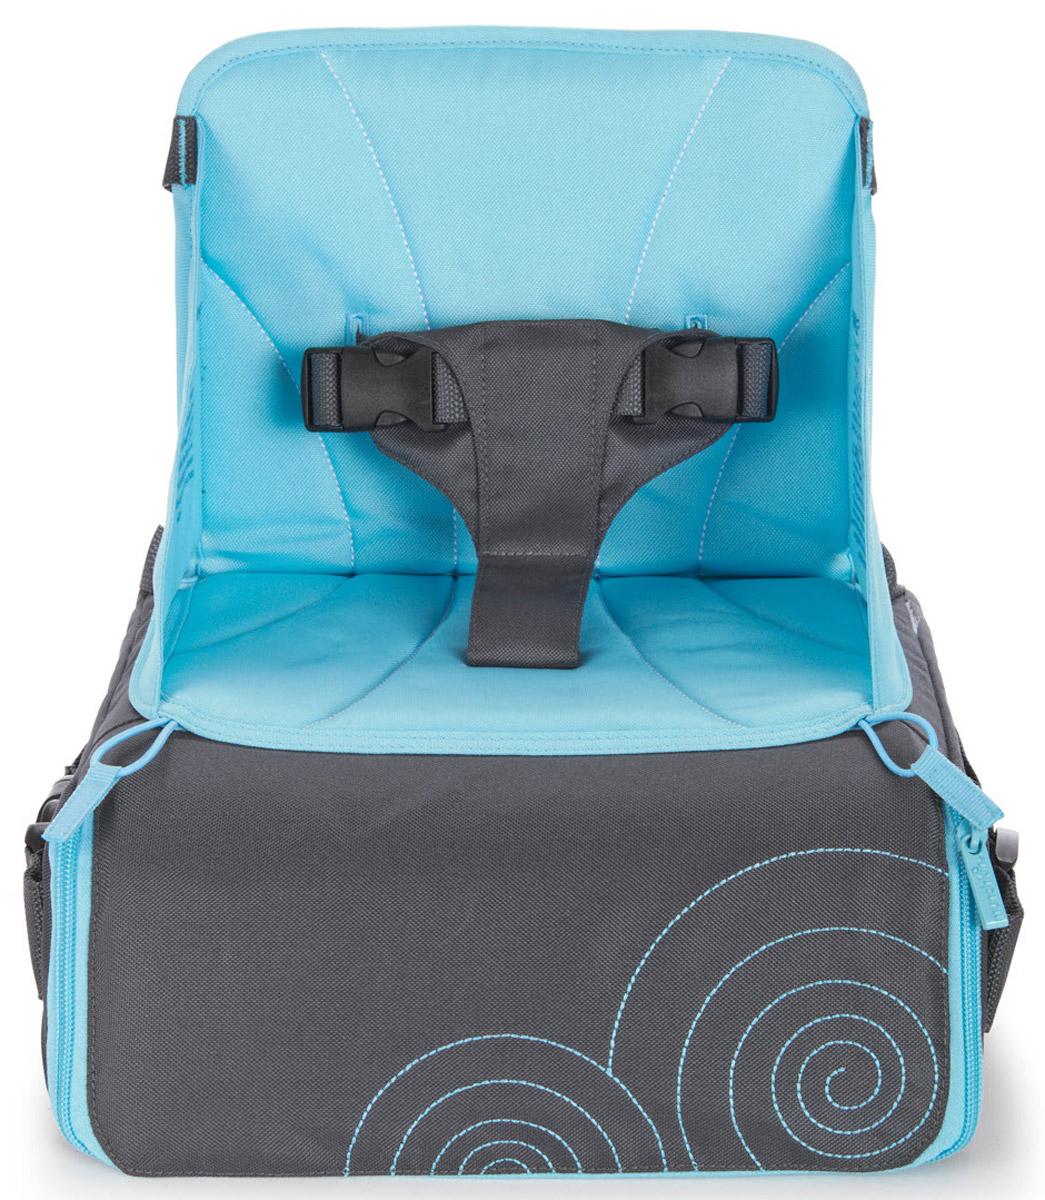 Munchkin Дорожный стульчик для кормления цвет серый голубой selby стульчик для кормления цвет белый зеленый 827378